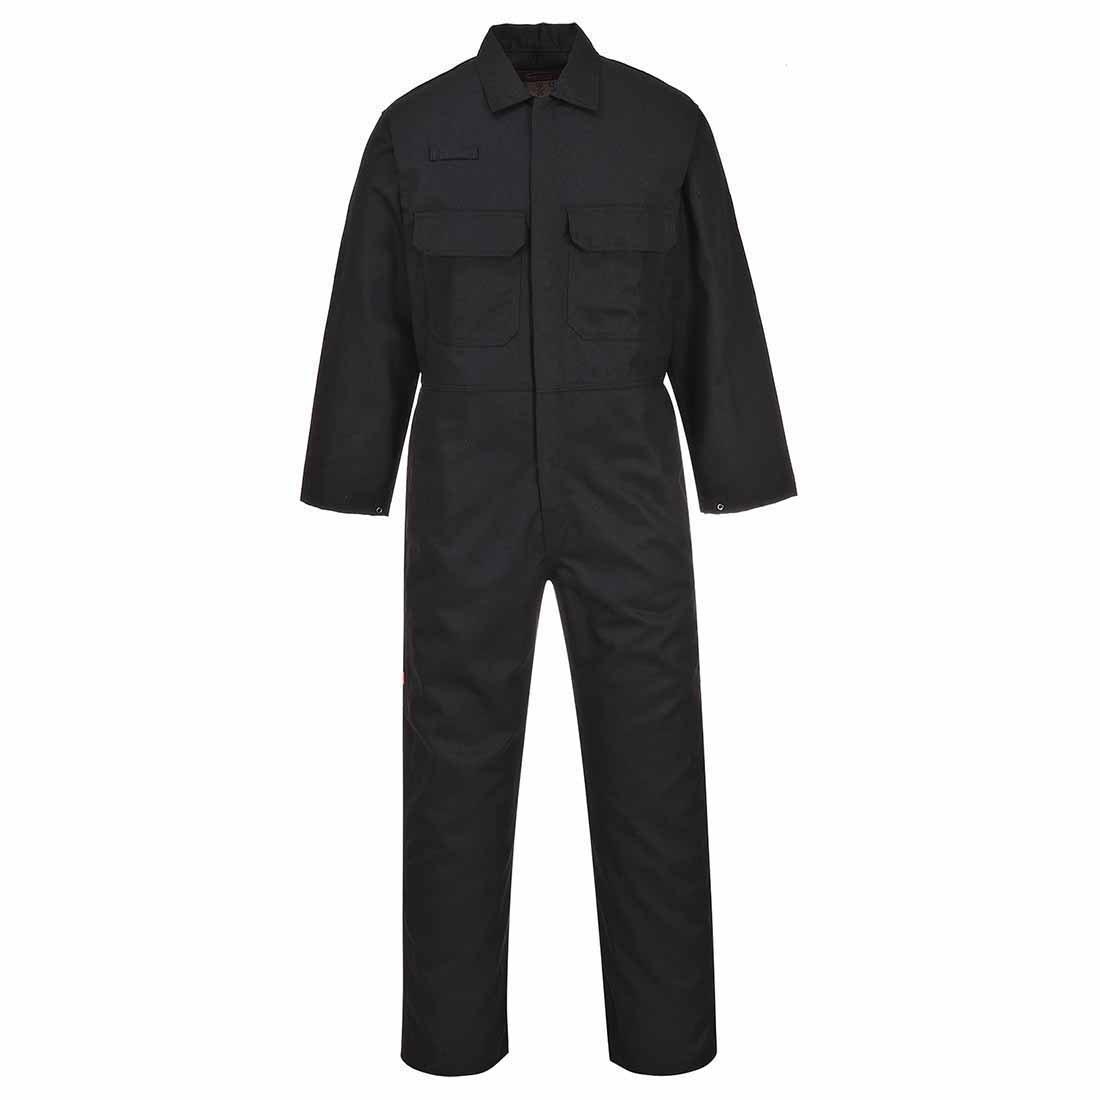 Portwest BIZ1RER4XL Bizweld Flame Resistant Coverall, Regular, Size: 4X-Large, Red Portwest Clothing Ltd